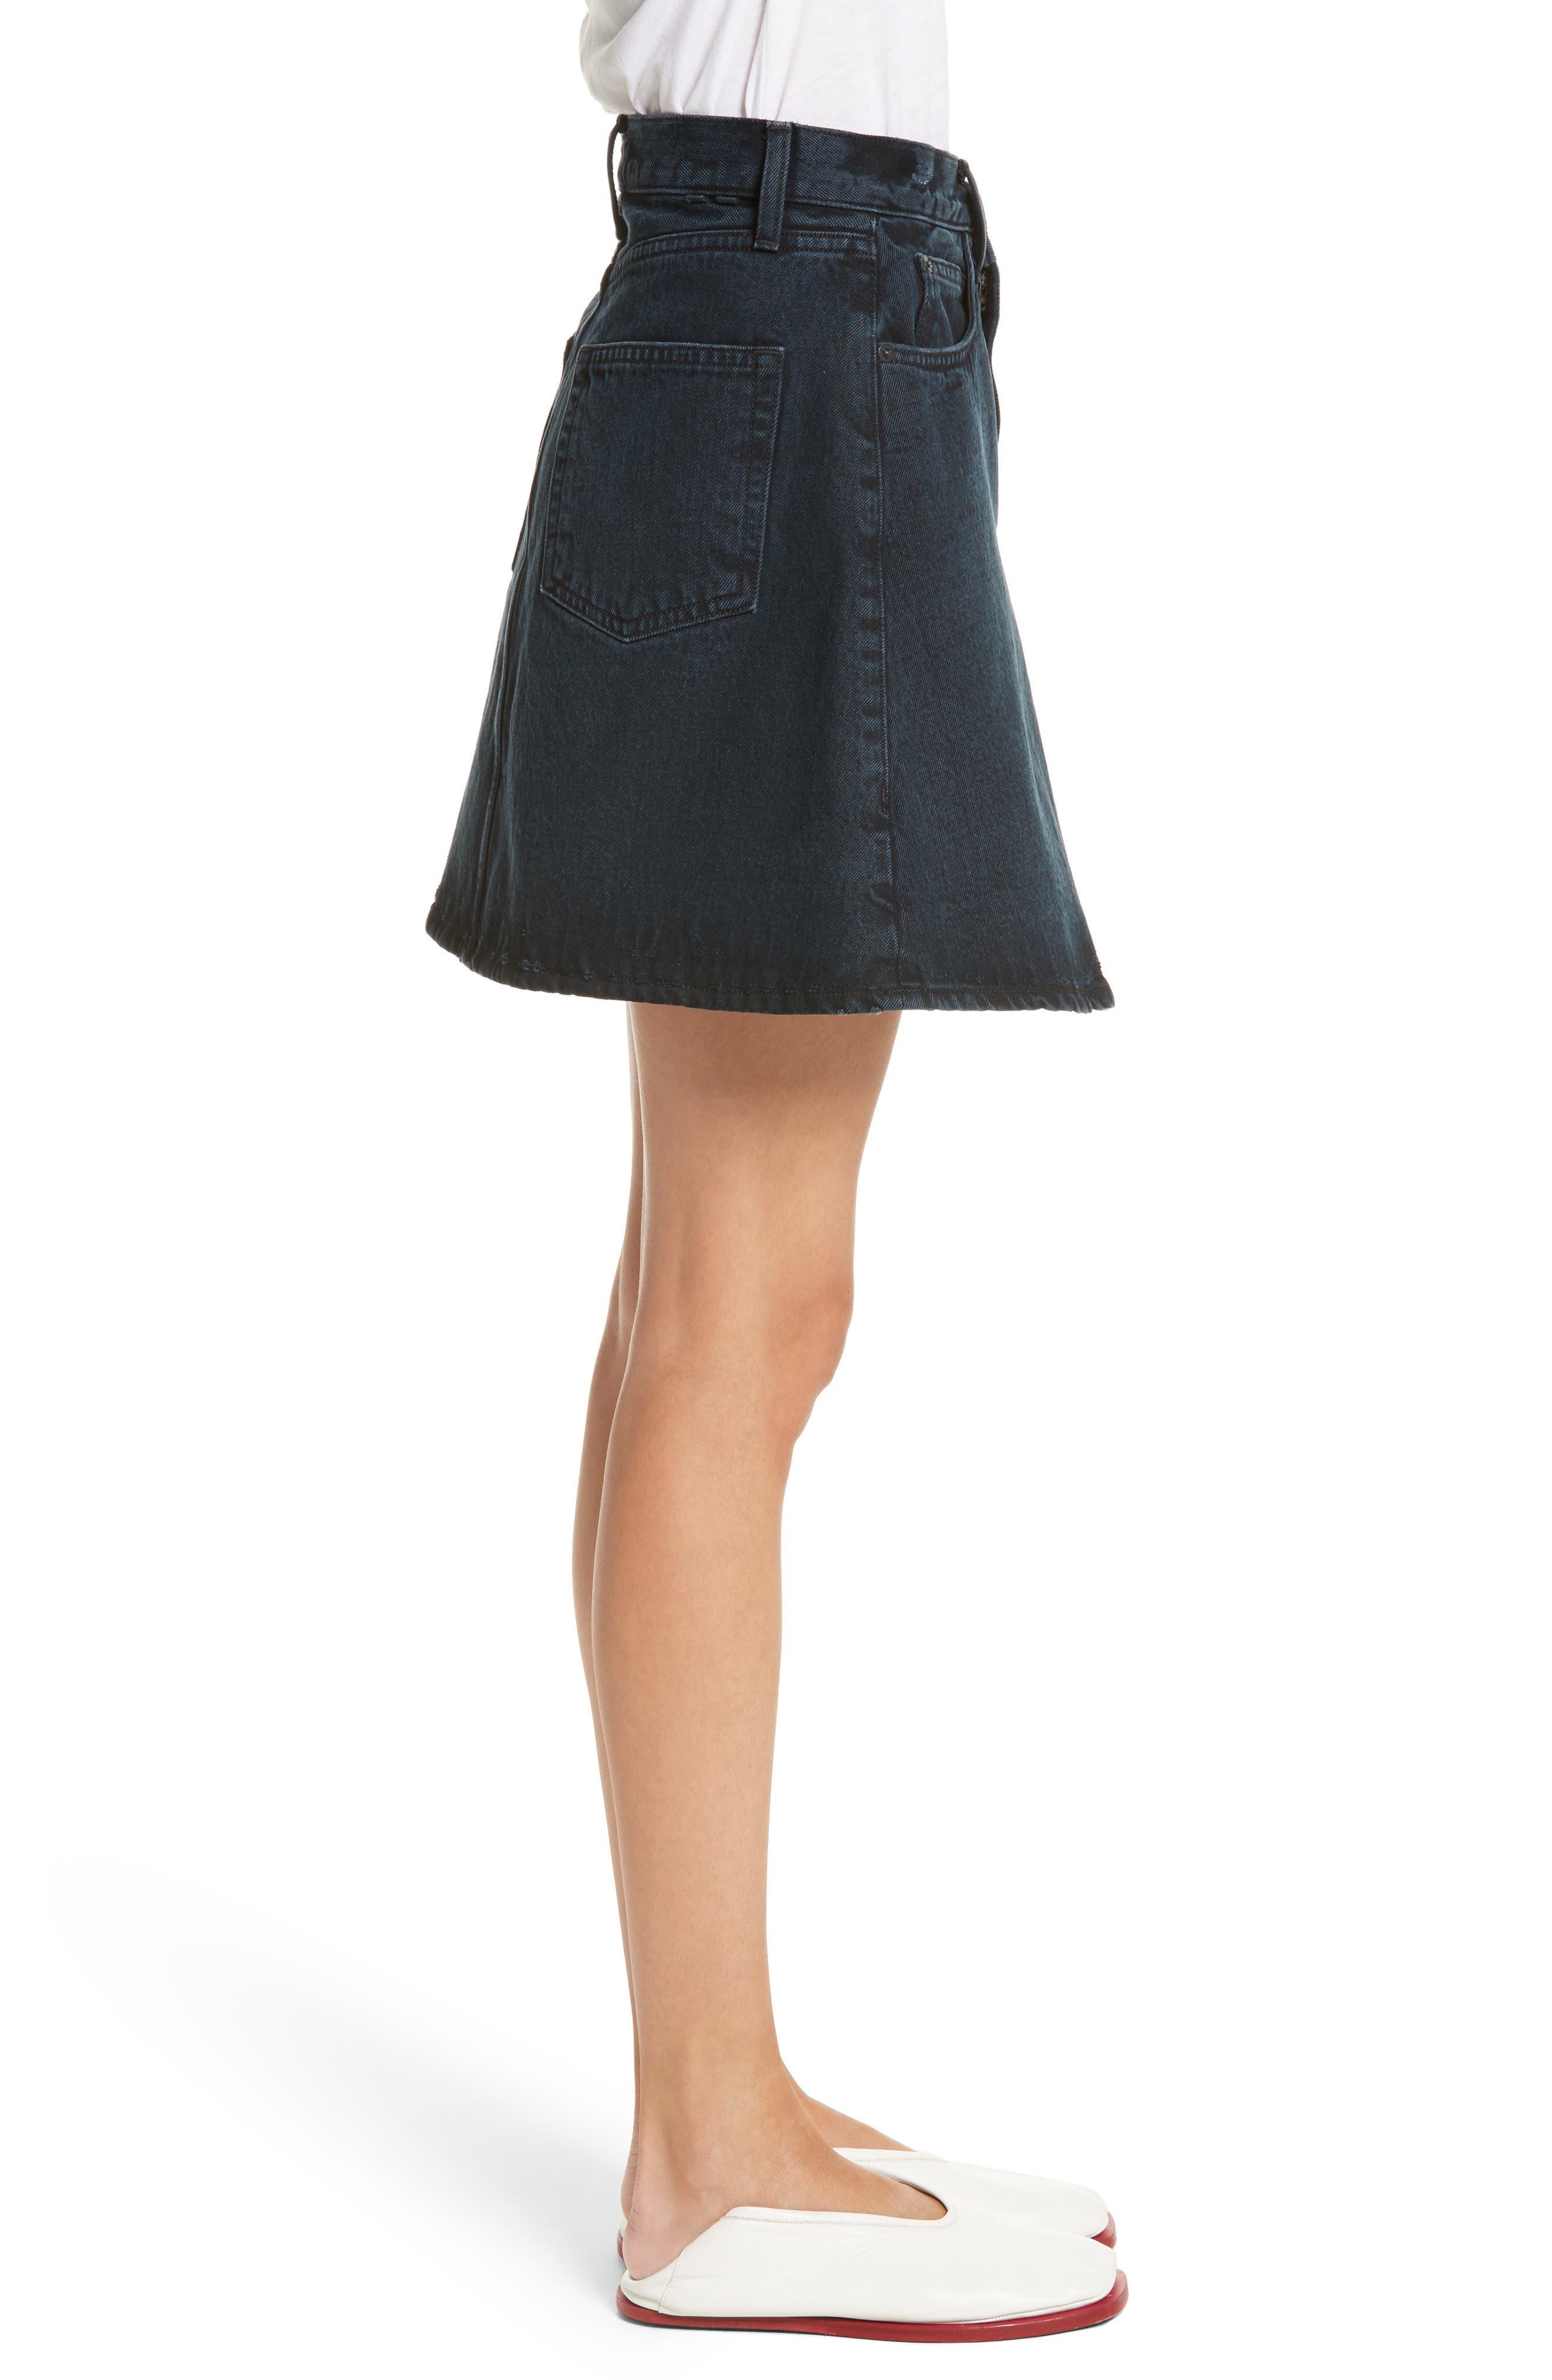 PSWL Folded Denim Skirt,                             Alternate thumbnail 3, color,                             Stone Washed Black